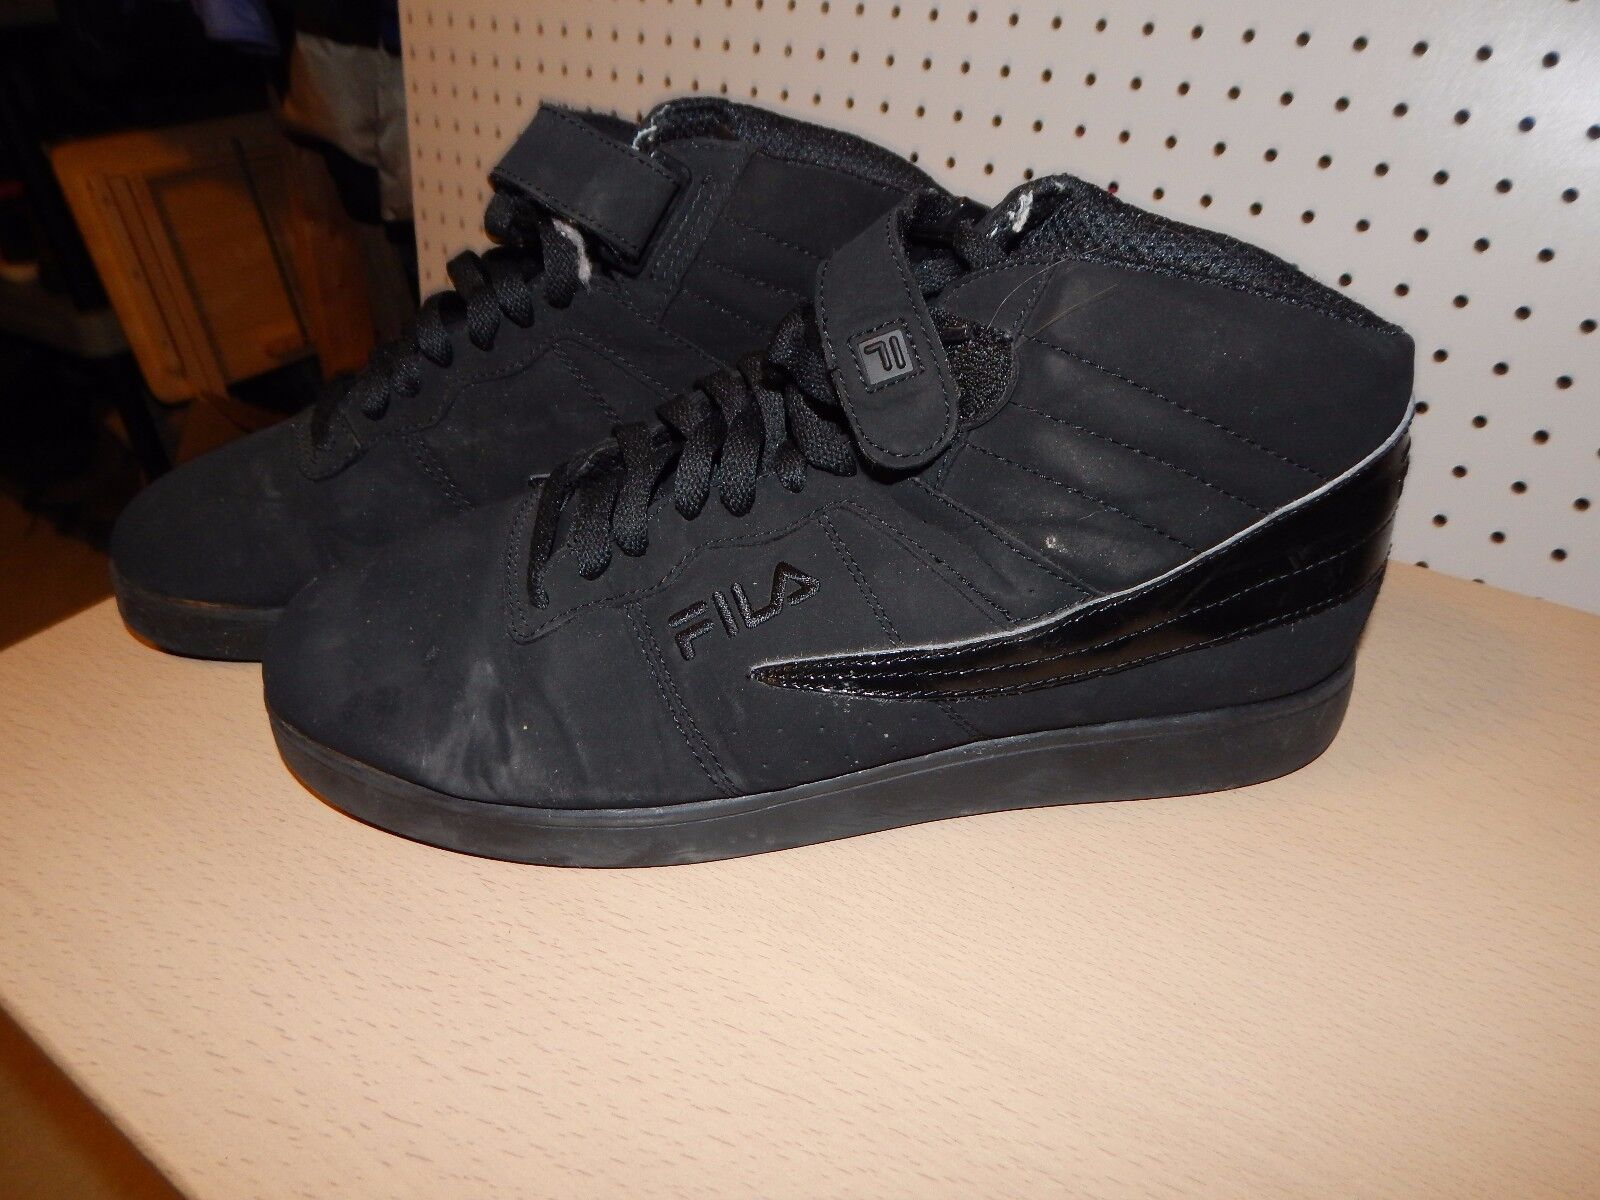 separation shoes e0264 2f410 Hombre de fila F13 Lite Athletic Shoes Negro 1sc082xk-001 especiales de  Hombre tiempo limitado tamaño 11 3fbc1f